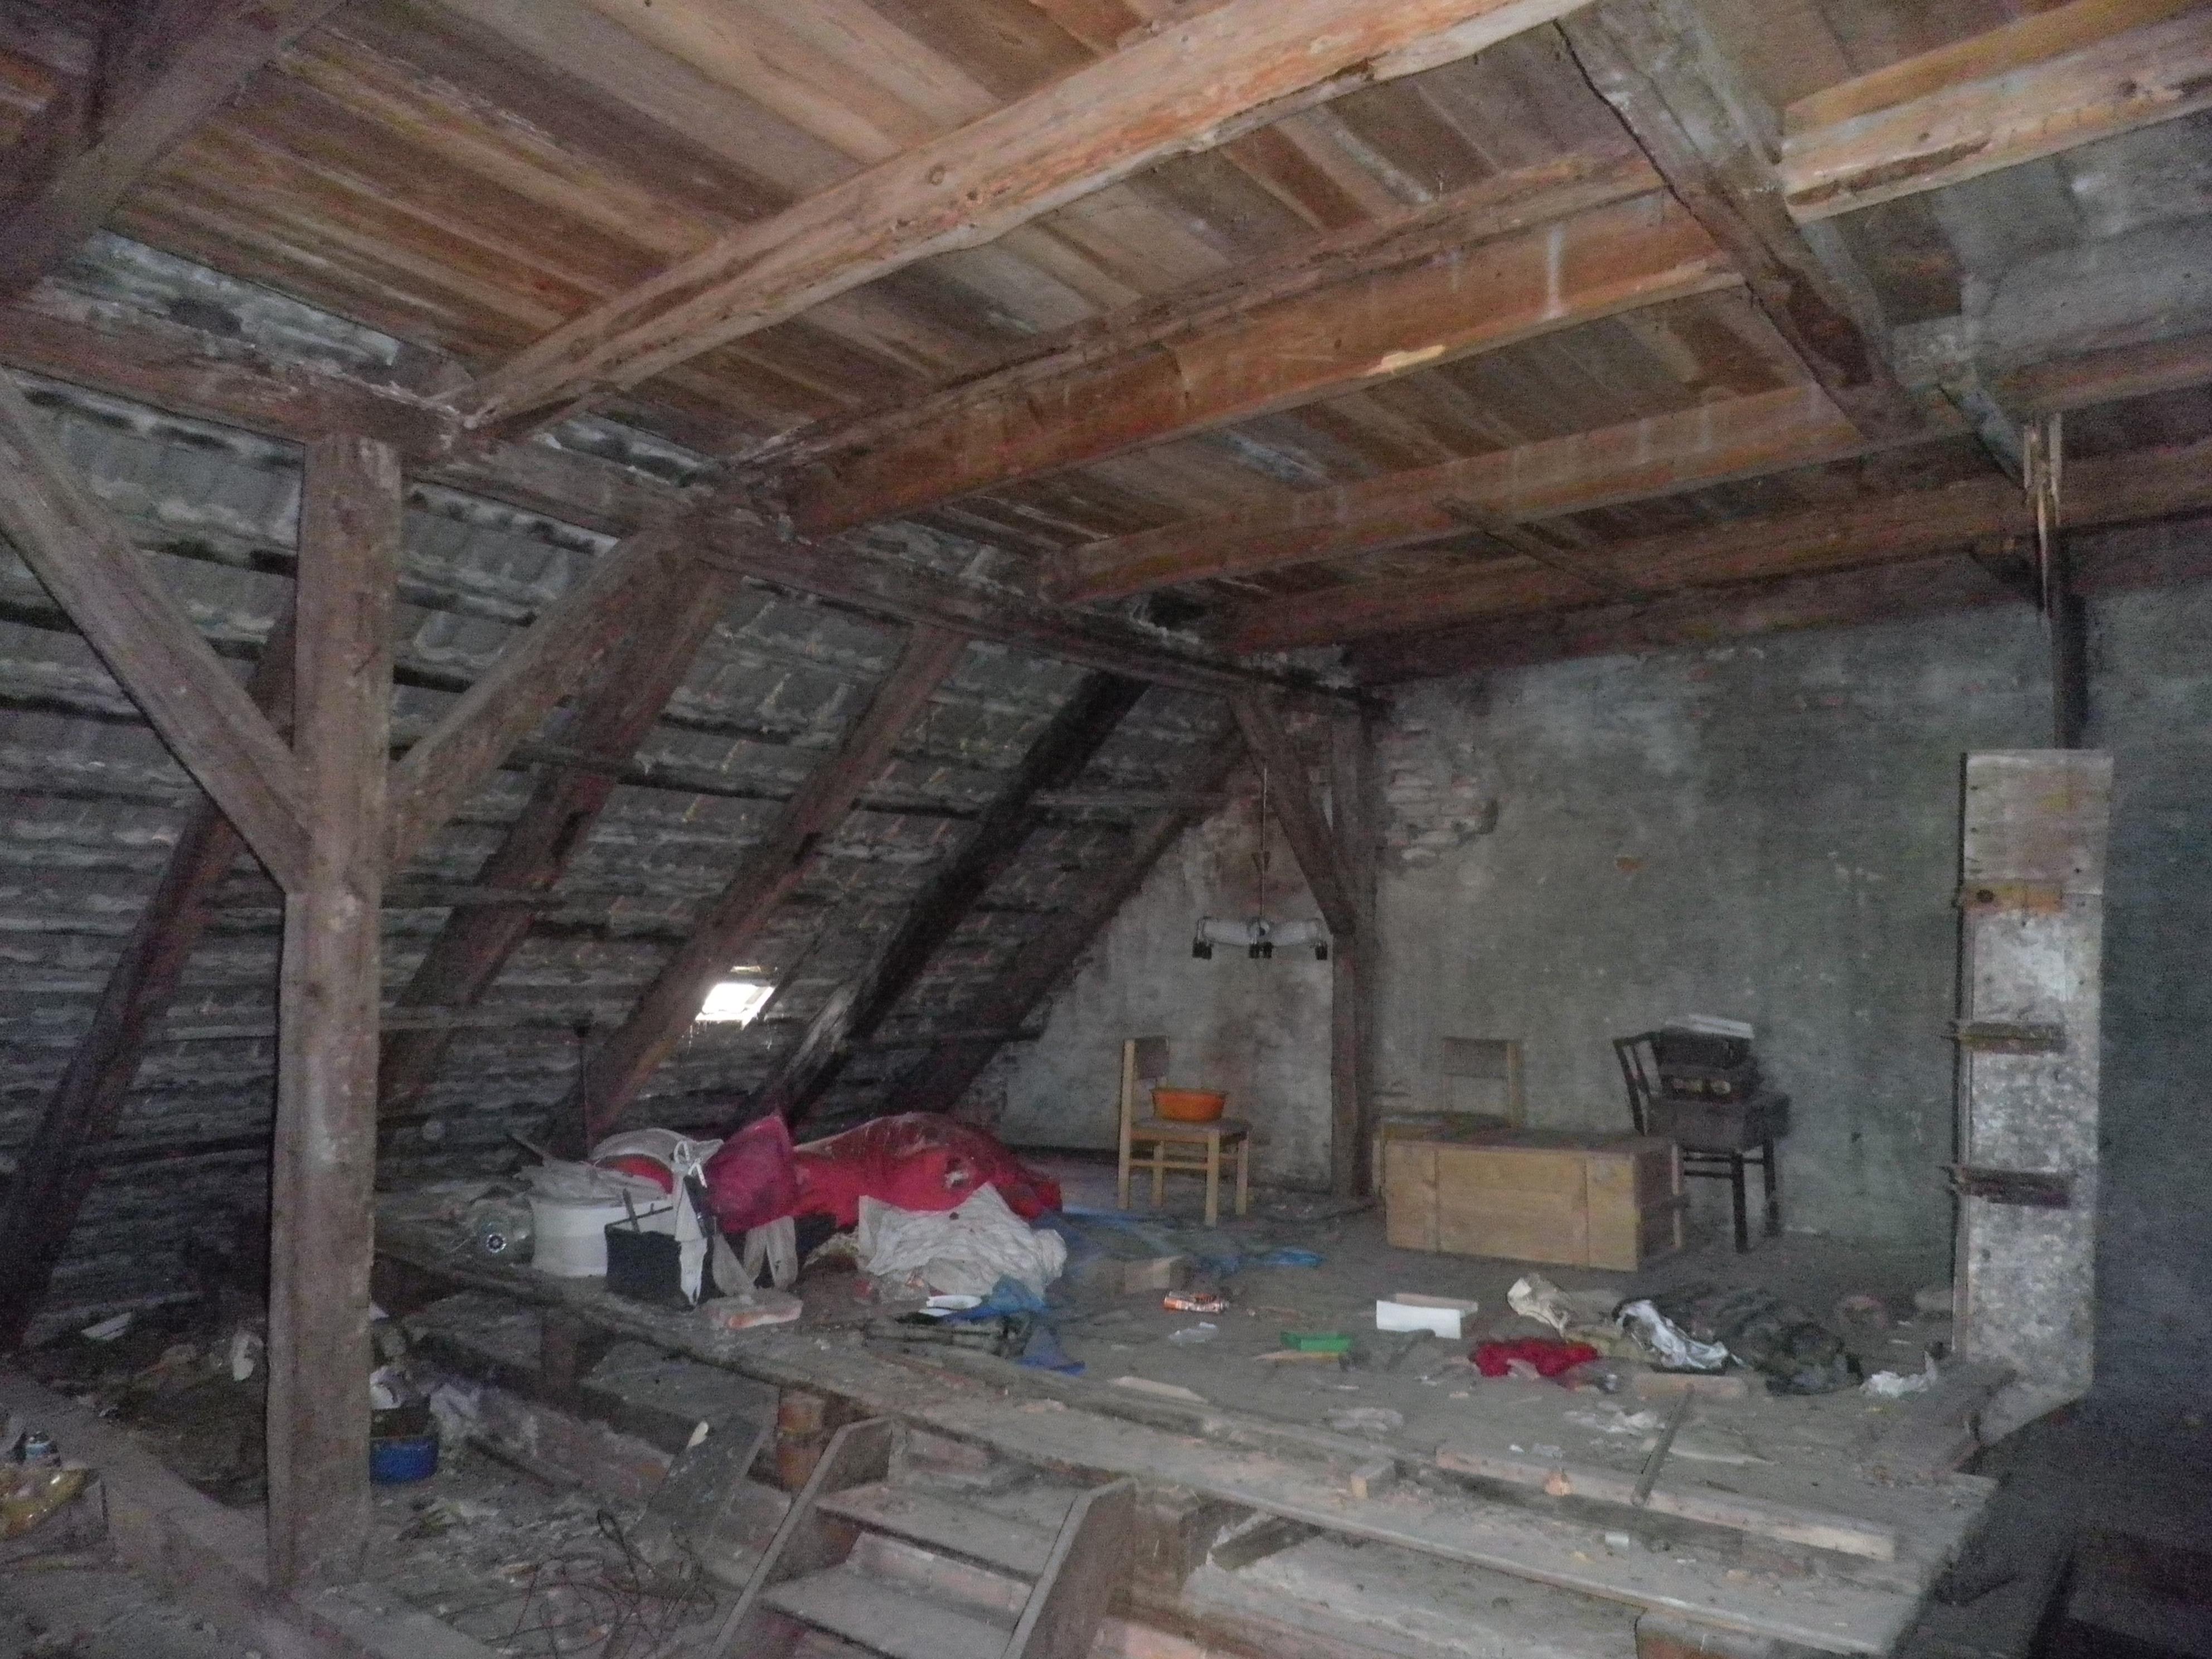 Wohnnung Ausbau Dachgeschoss mit Reserven